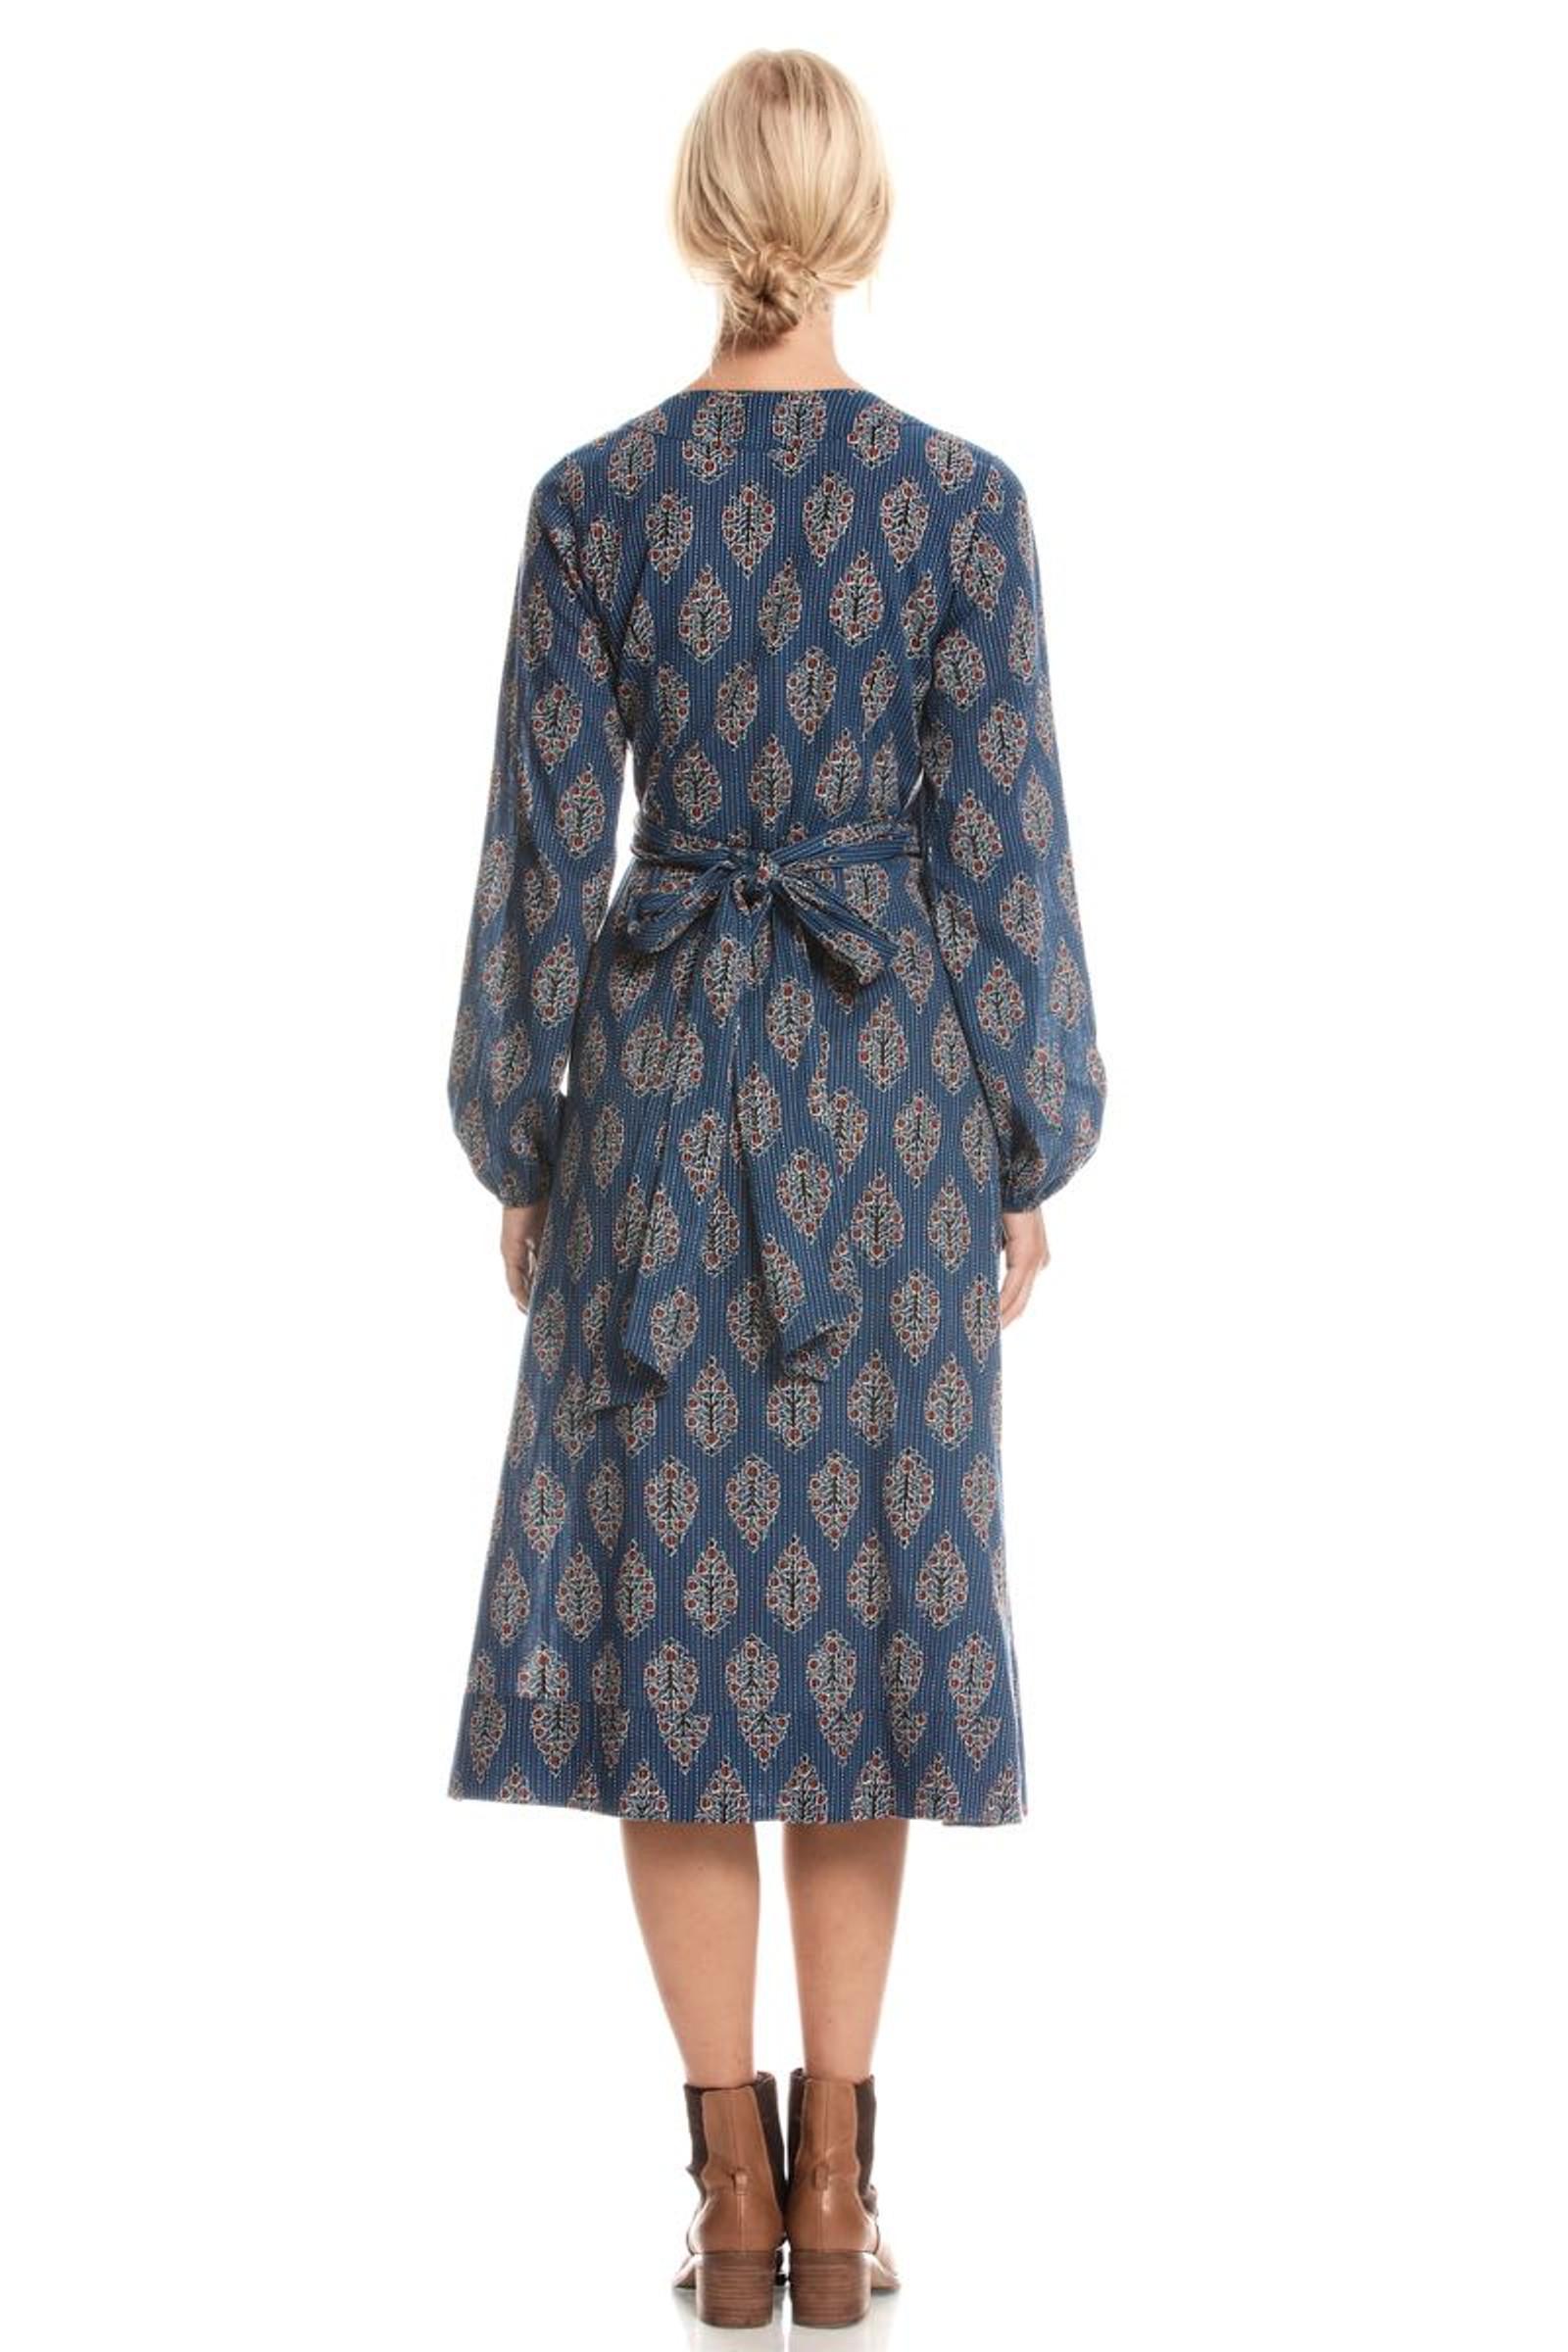 Sabina Wrap Dress Stitch - Bodhi